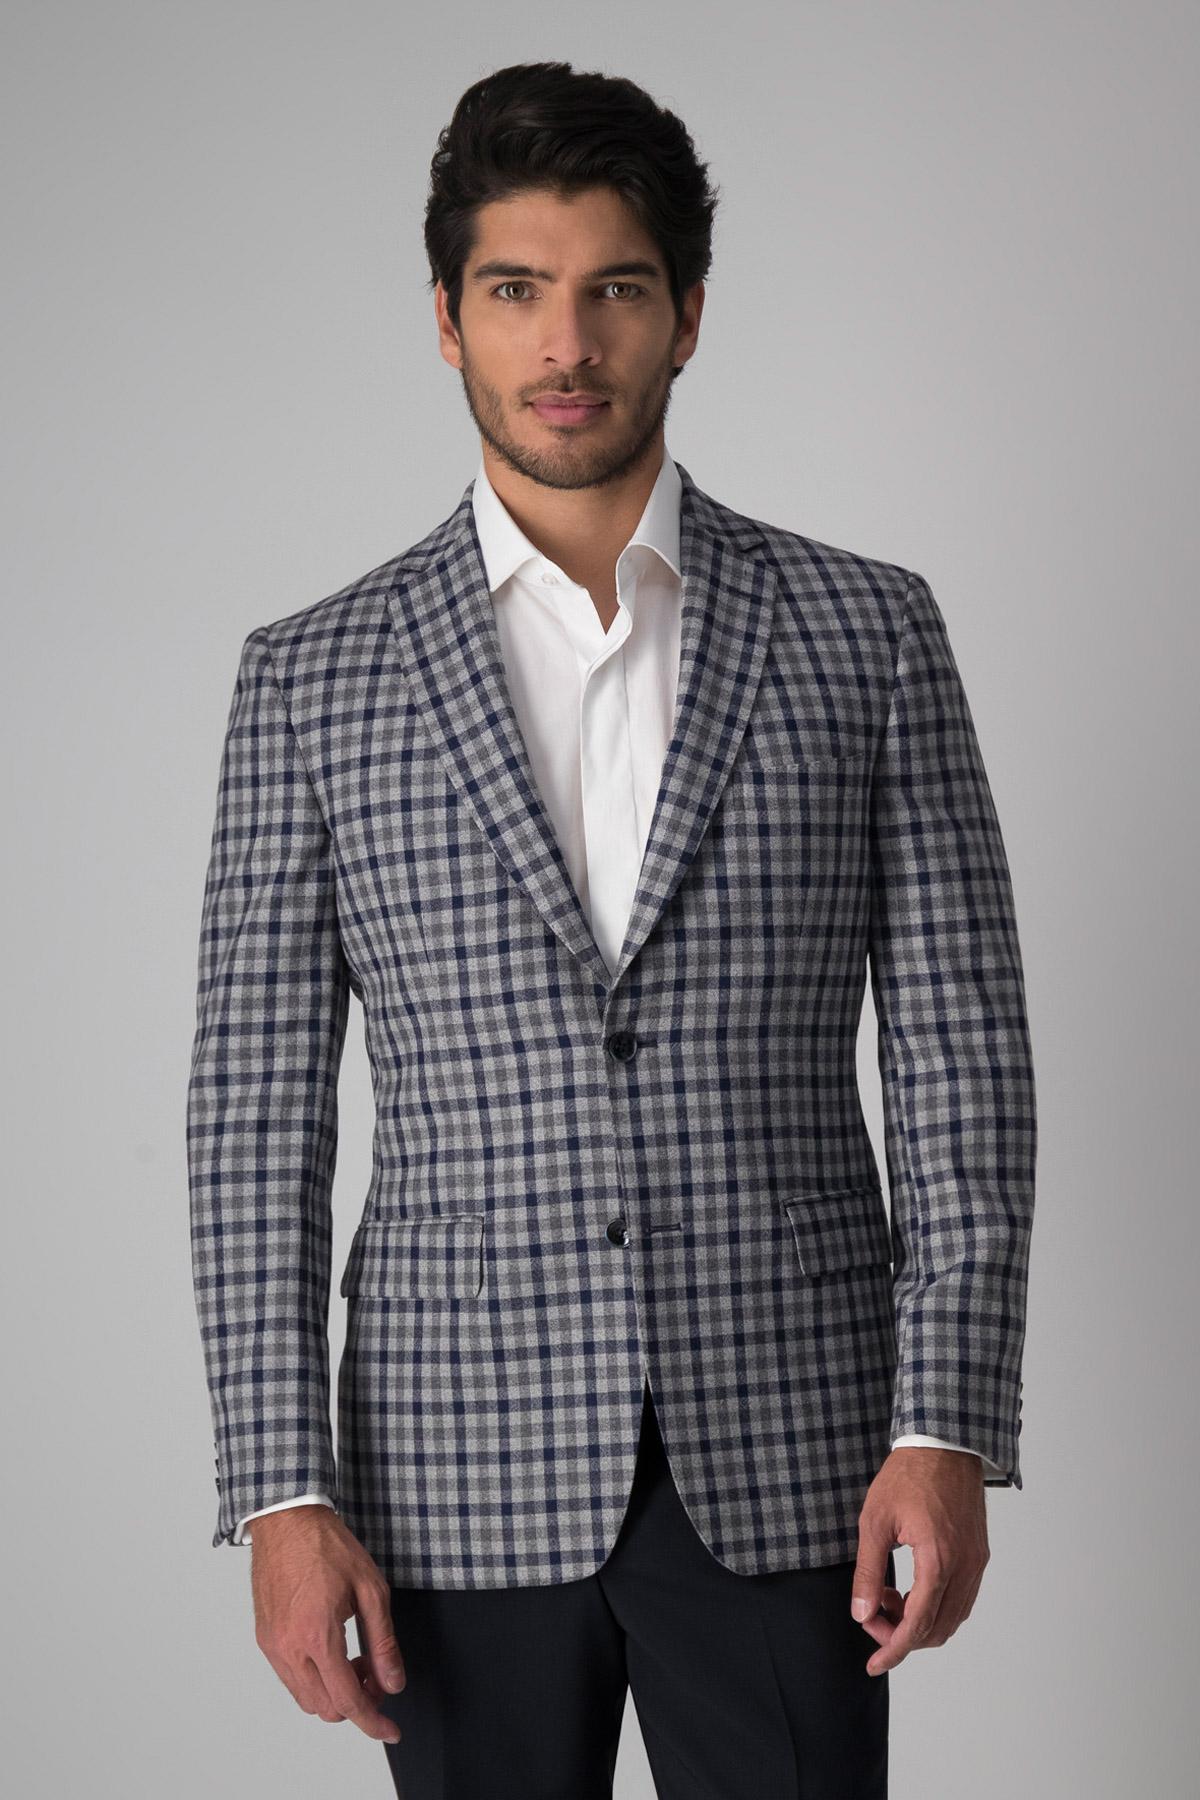 Saco Calderoni, 100%lana tela italiana, slim fit, gris con cuadros azul.